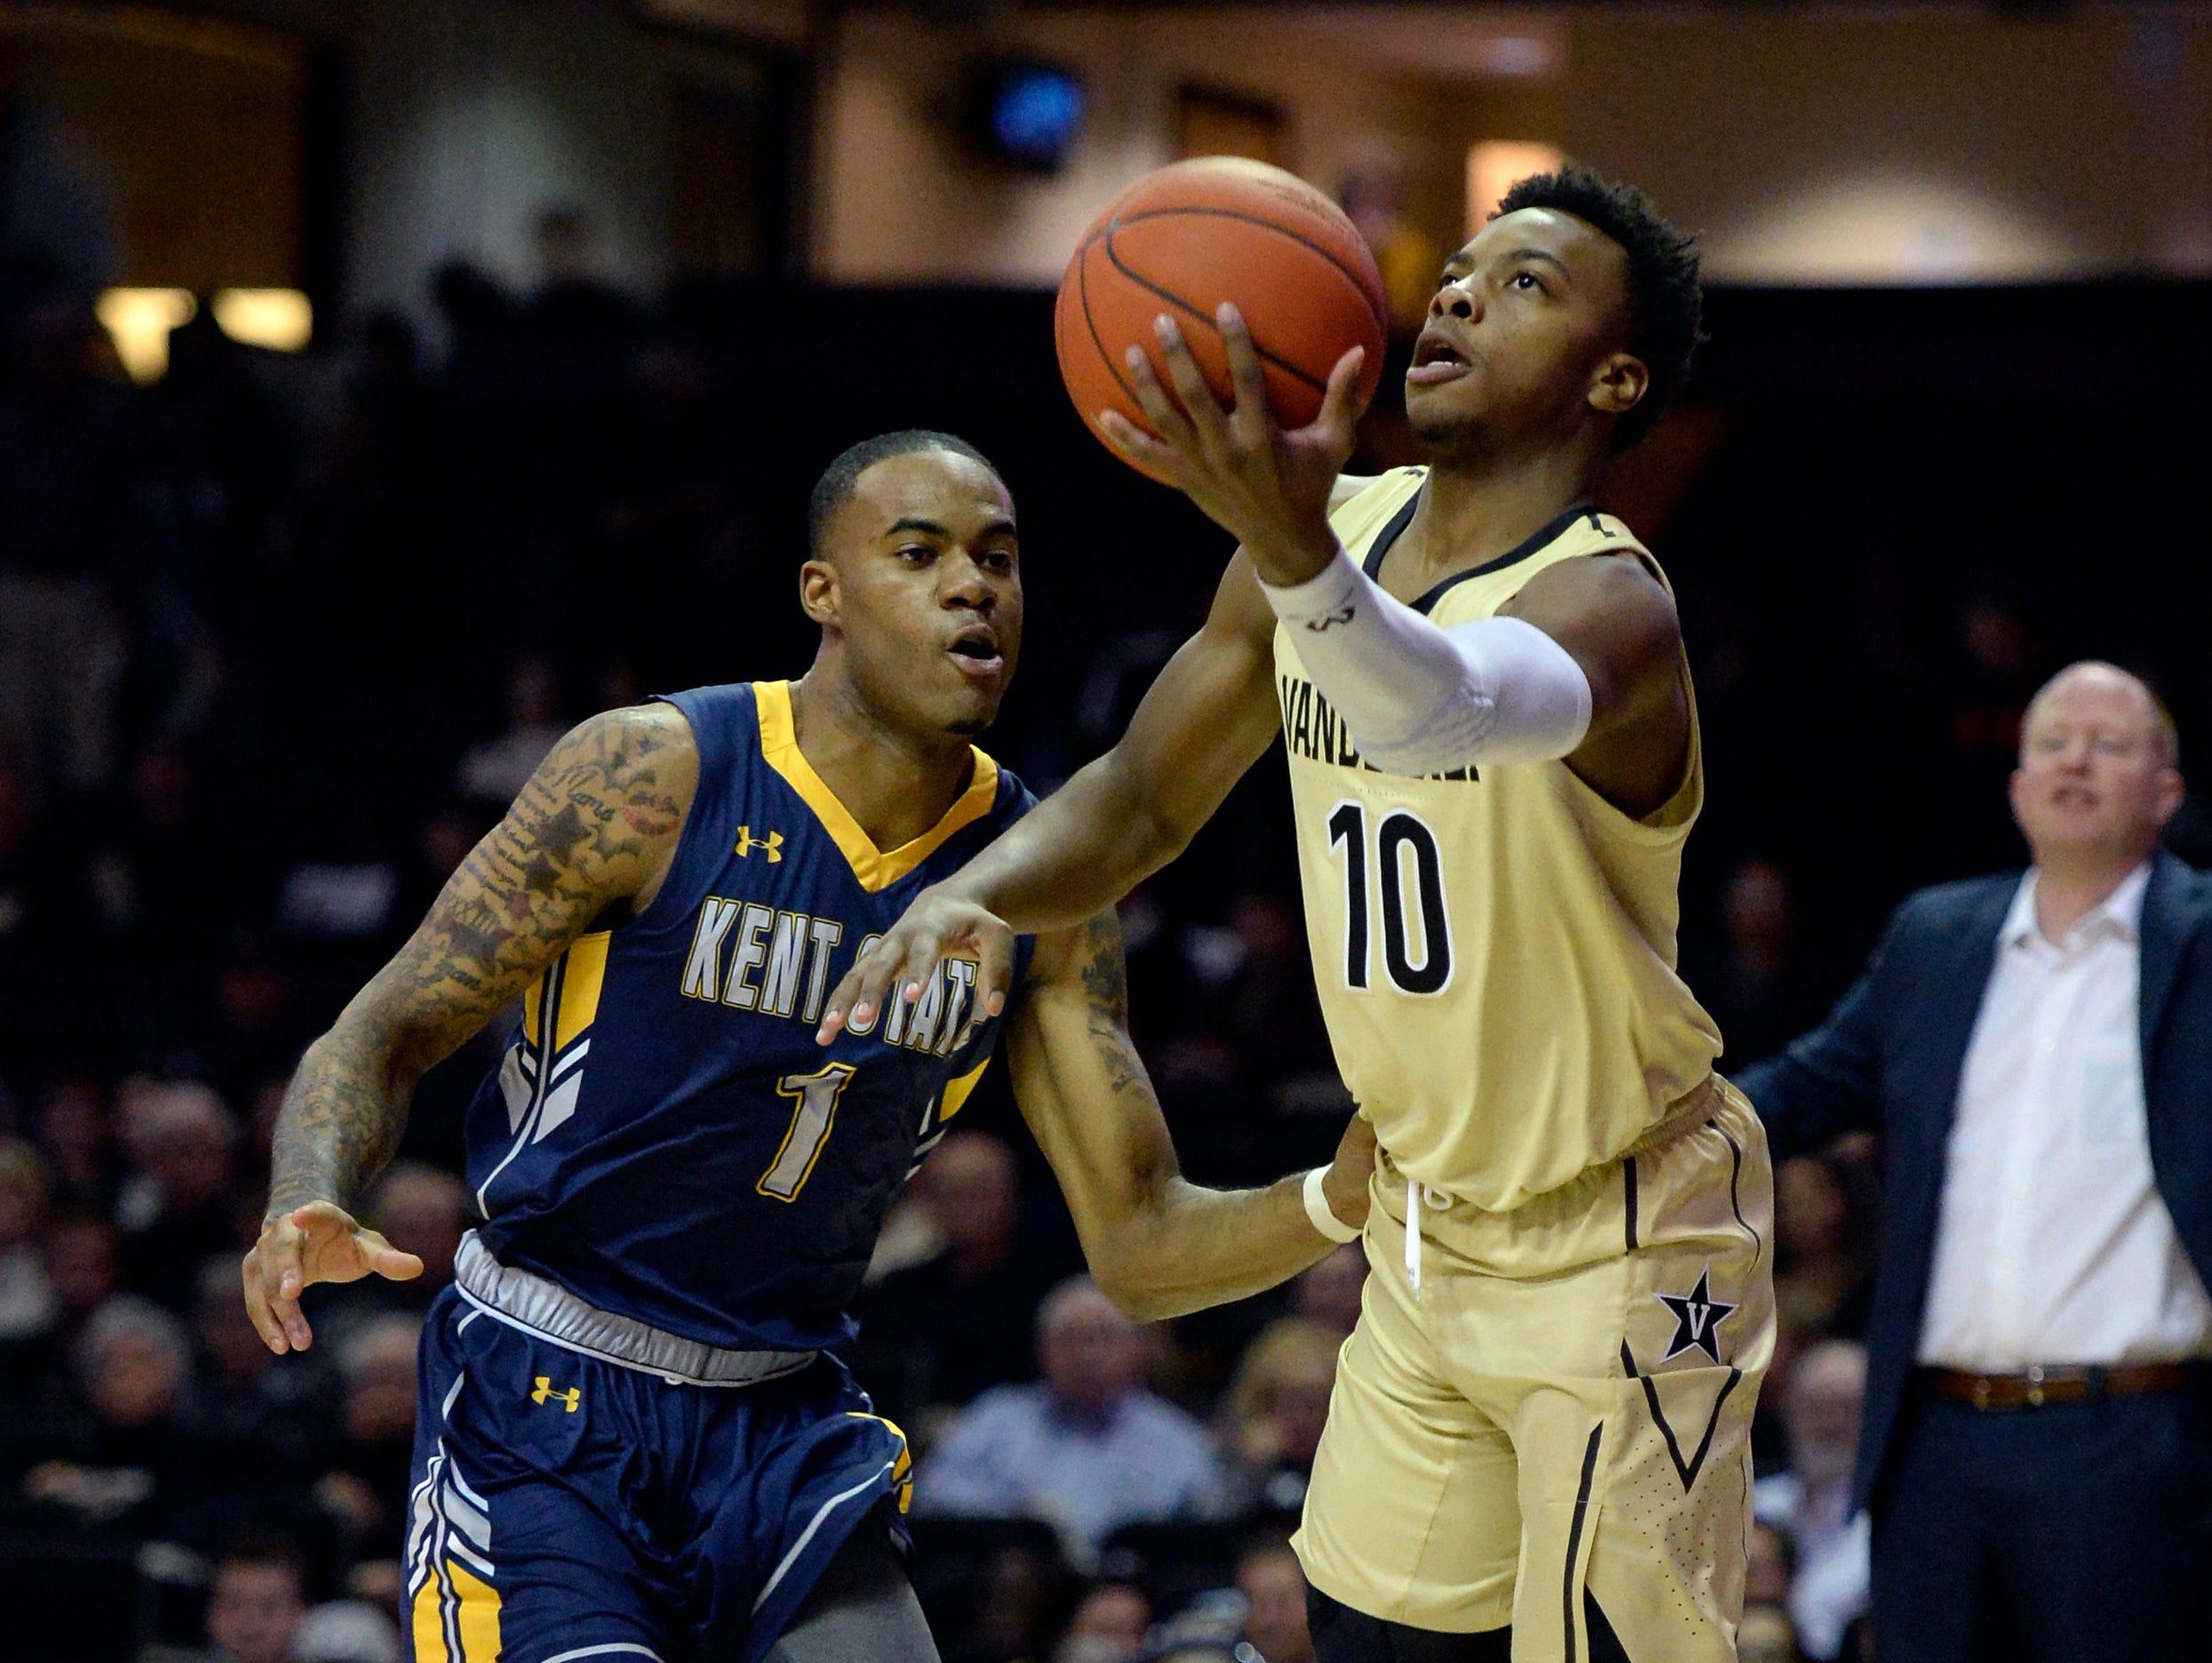 Vanderbilt guard Darius Garland (10) drives past Kent State guard C.J. Williamson (1) during the first half of an NCAA college basketball game Friday, Nov. 23, 2018, in Nashville, Tenn.